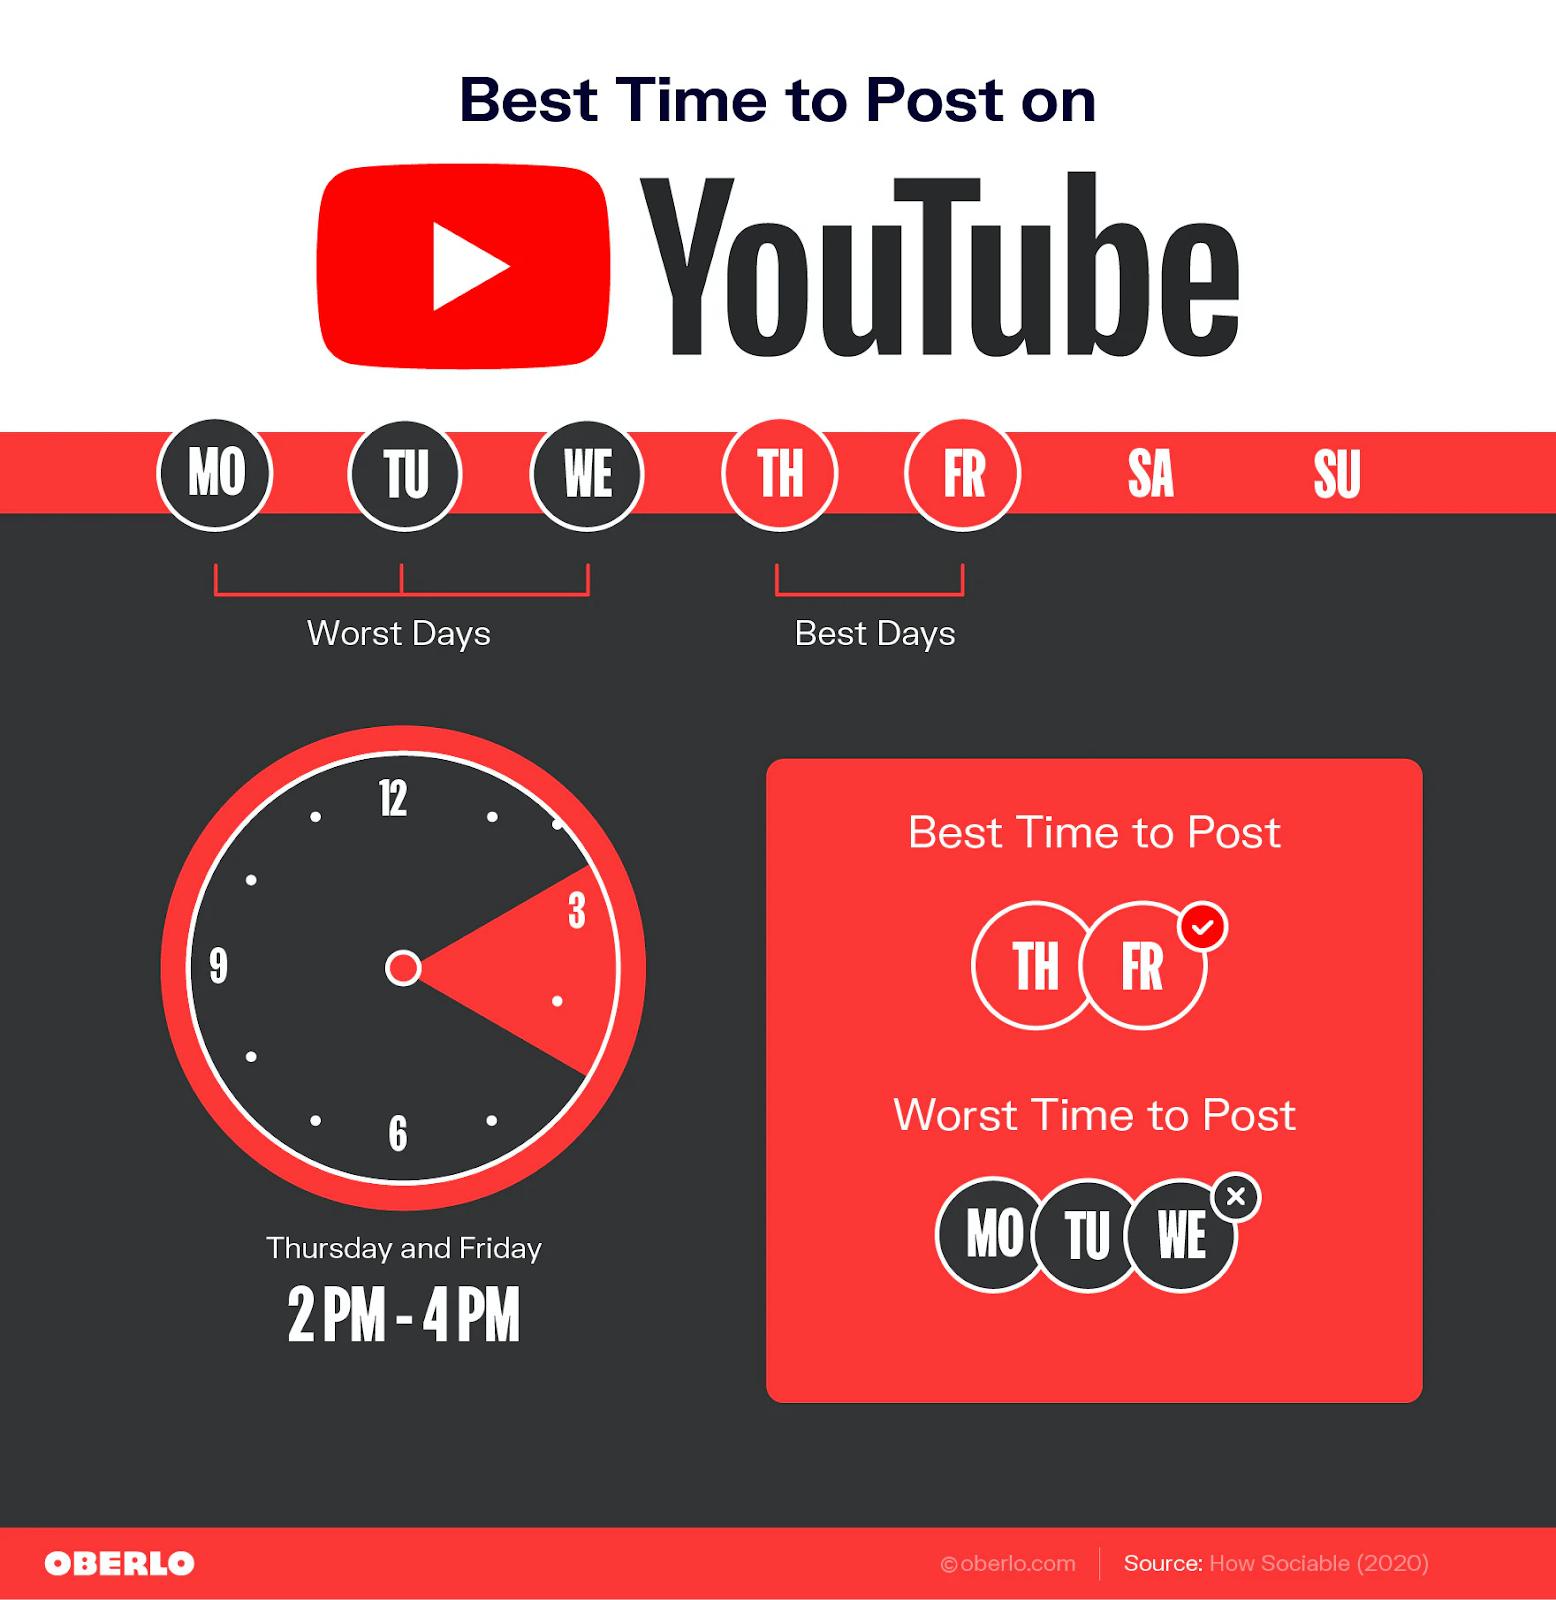 Youtube digital marketing plan  https://thedigitalmarketinginstitute.org/